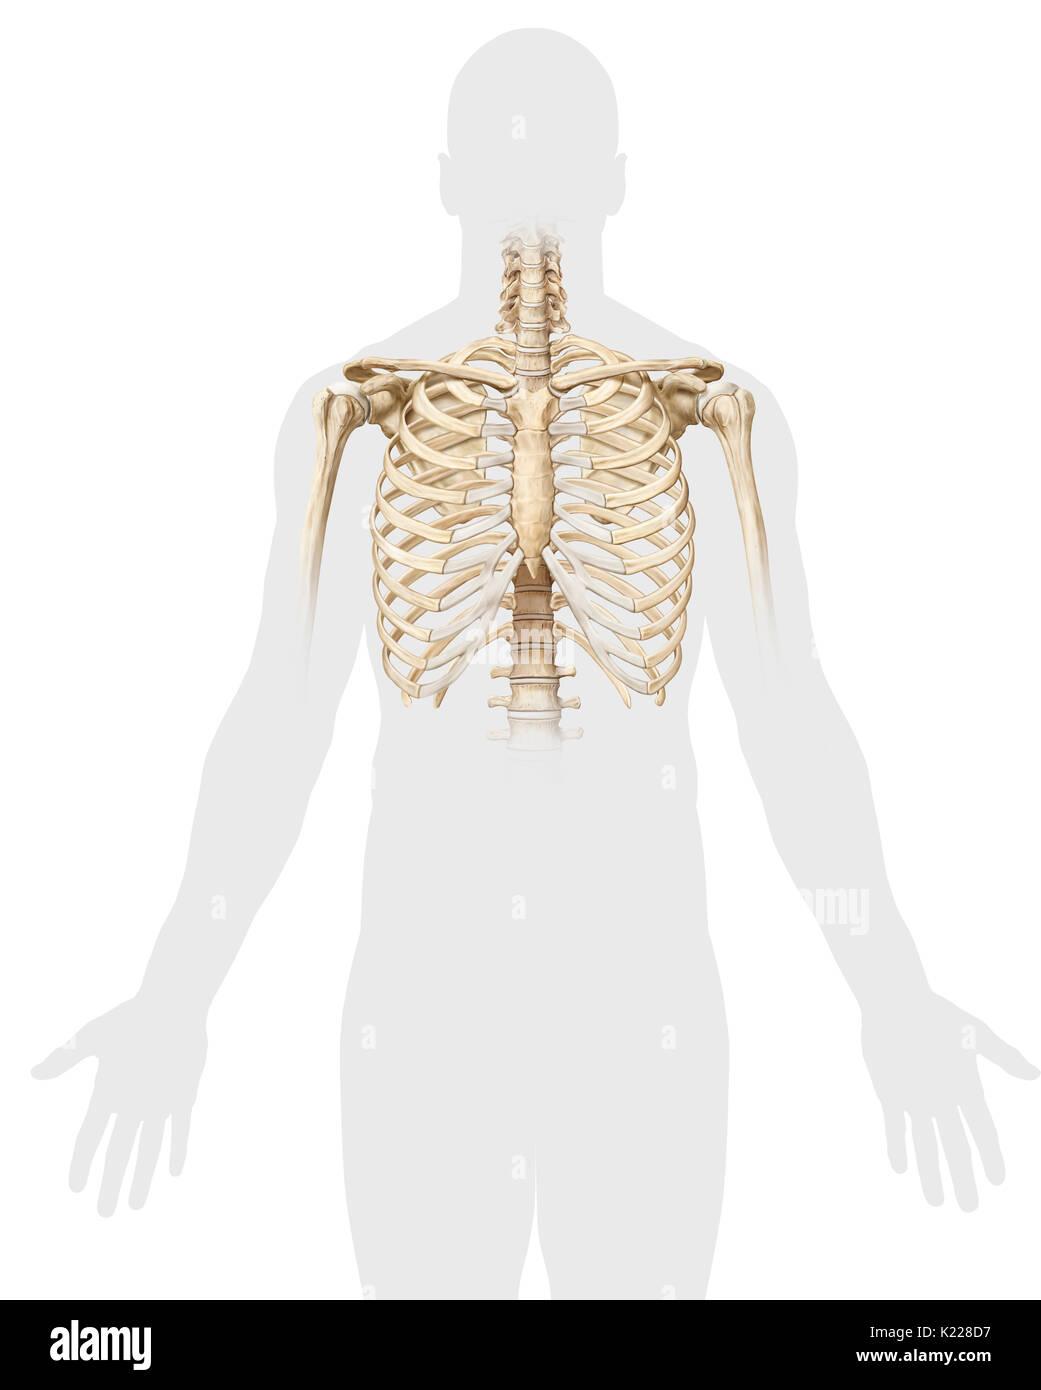 Schön Brust Knochenanatomie Fotos - Anatomie Ideen - finotti.info